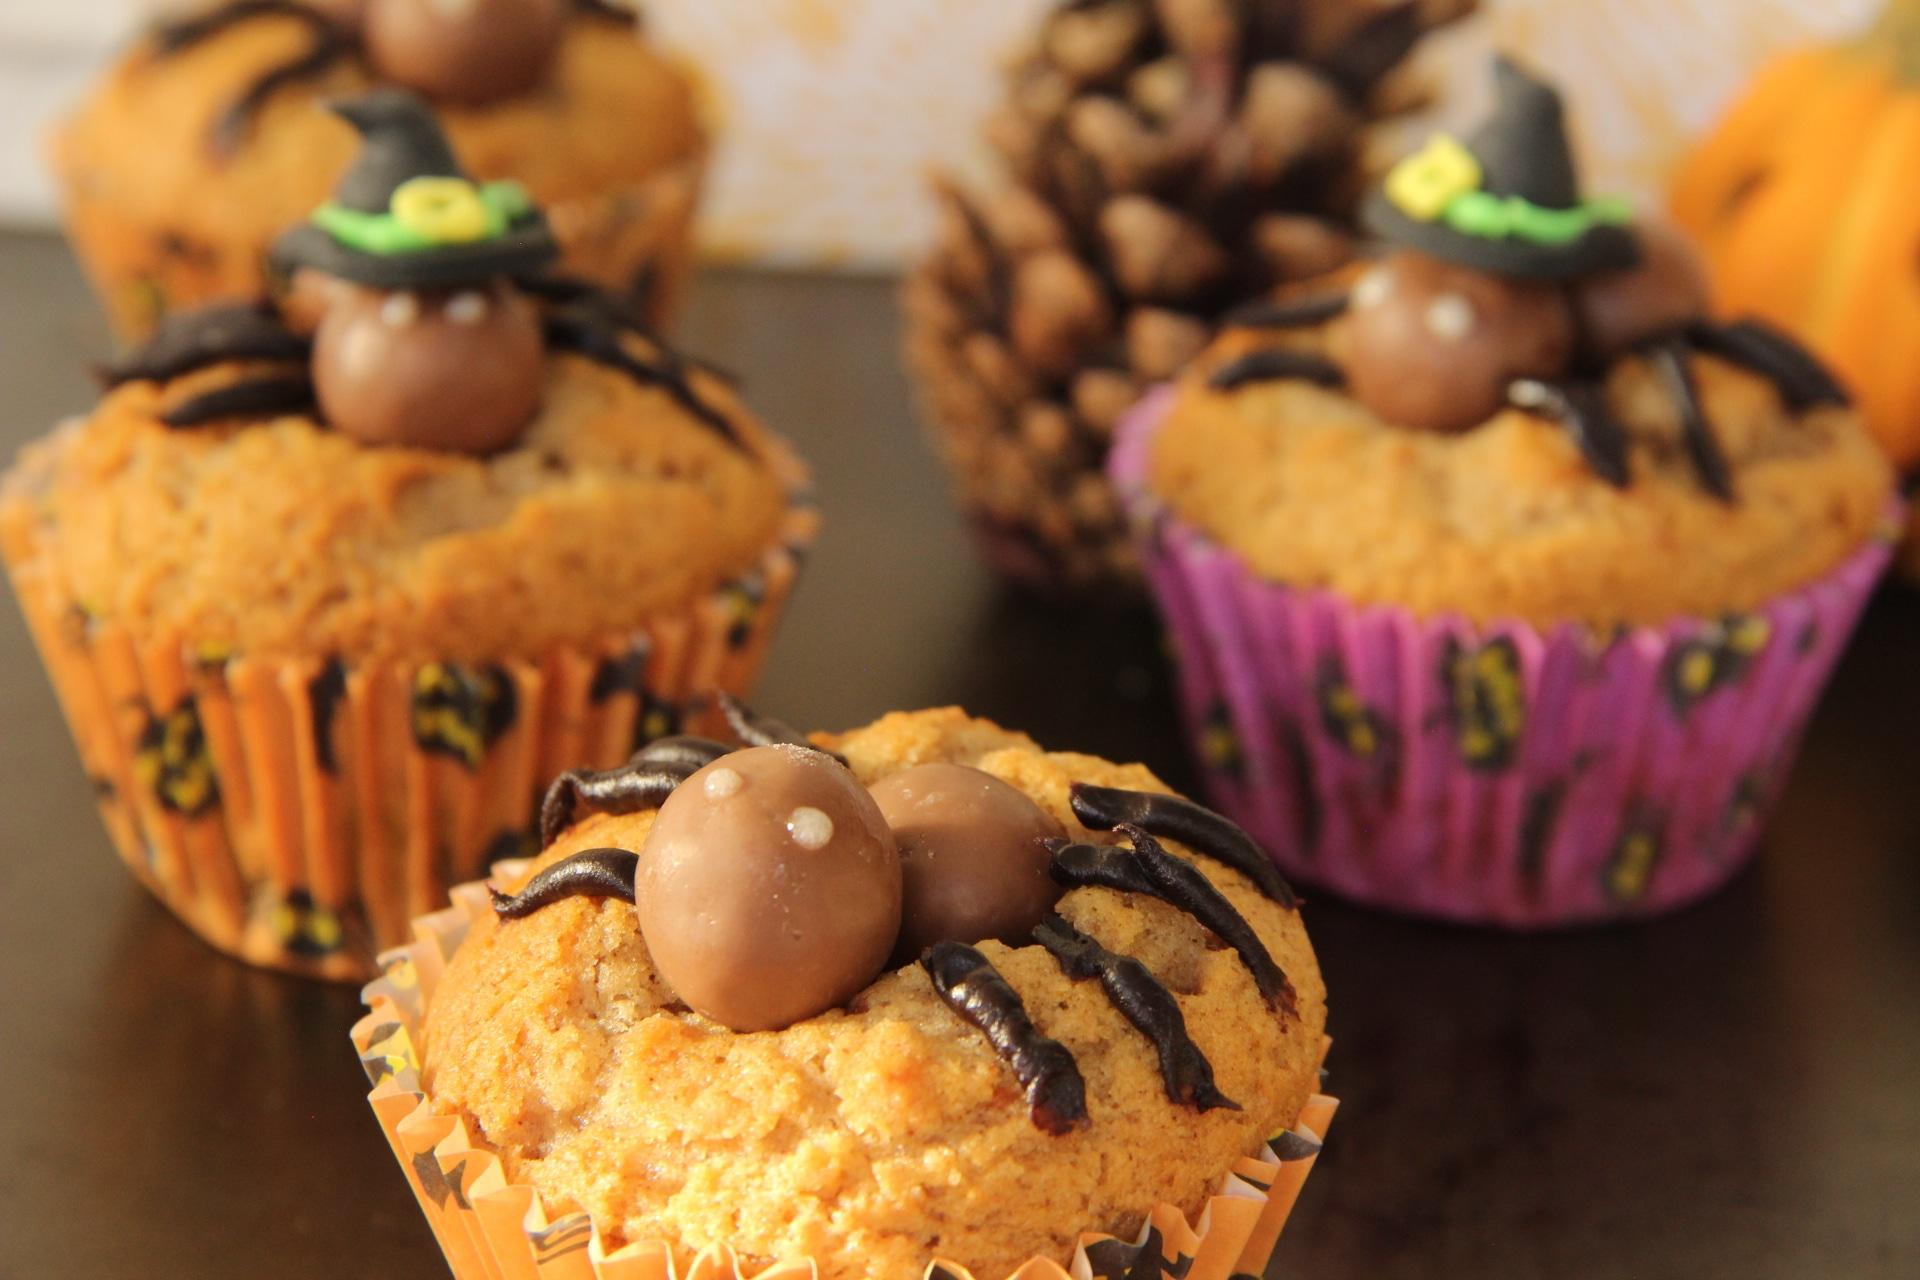 Recette d'Halloween - carrot cupcakes aux araignées Maltersers